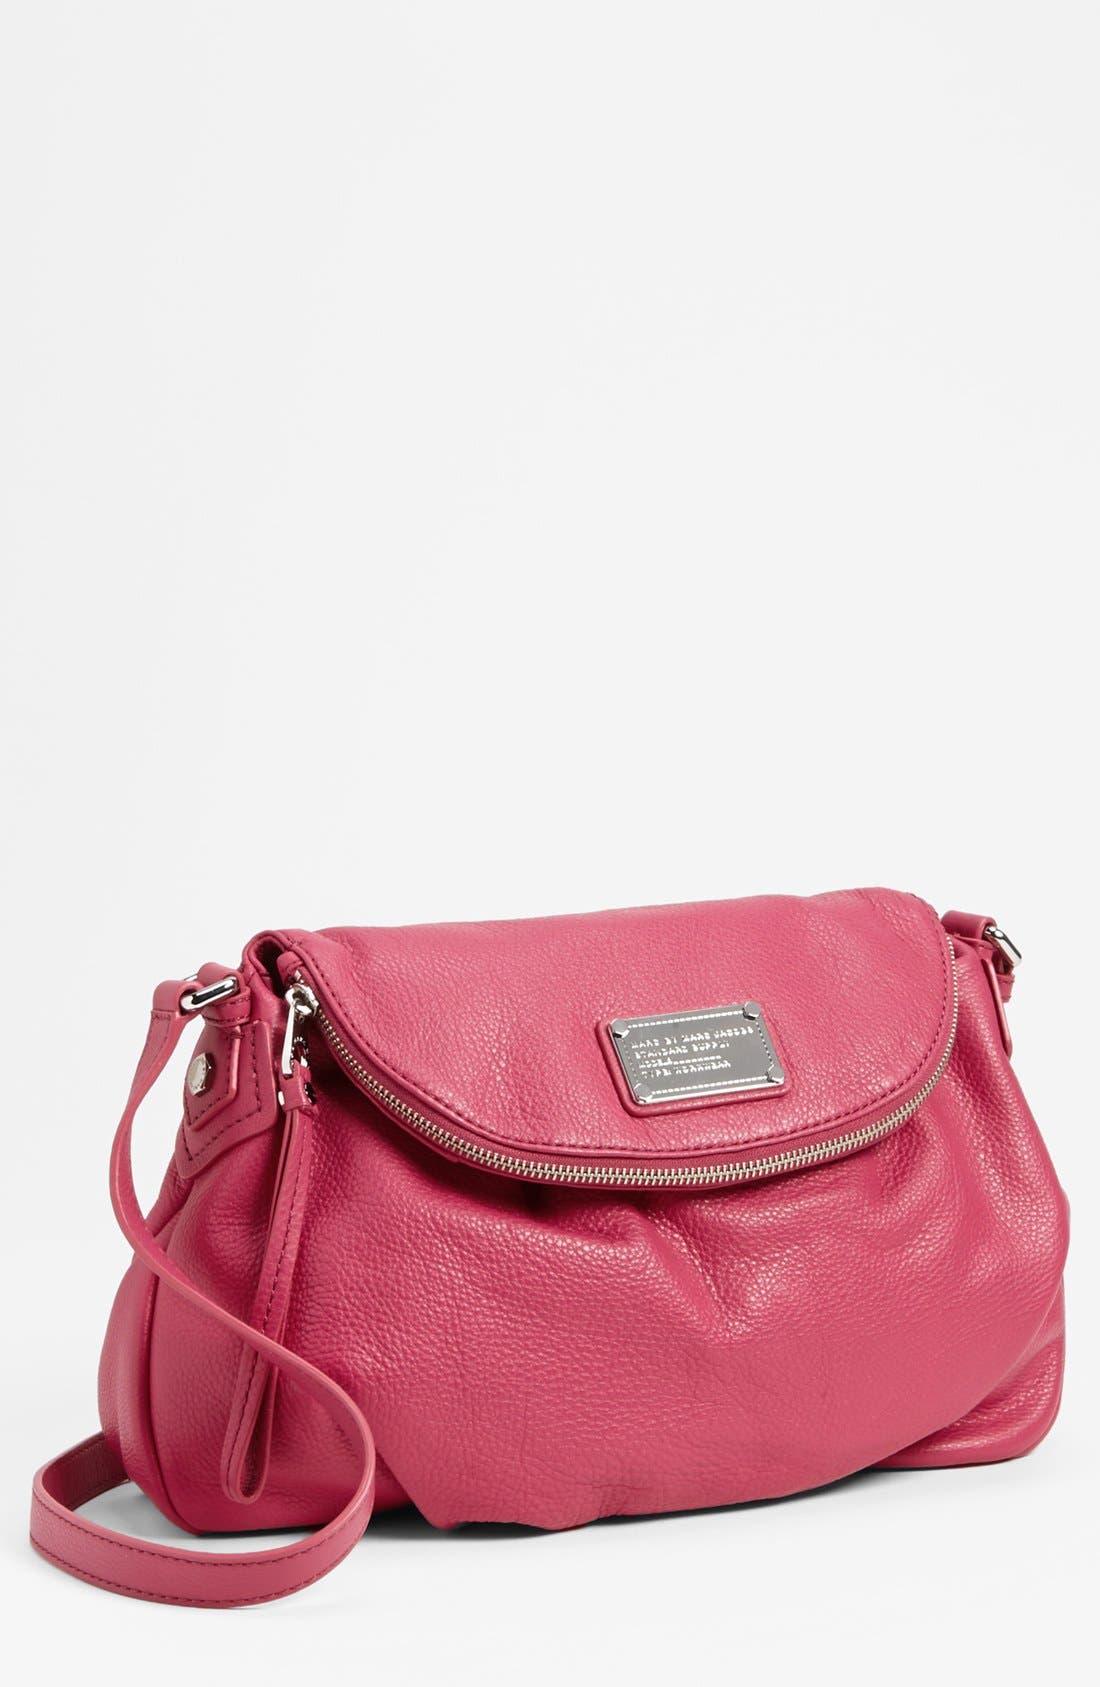 Alternate Image 1 Selected - MARC BY MARC JACOBS 'Classic Q - Natasha' Crossbody Flap Bag, Medium